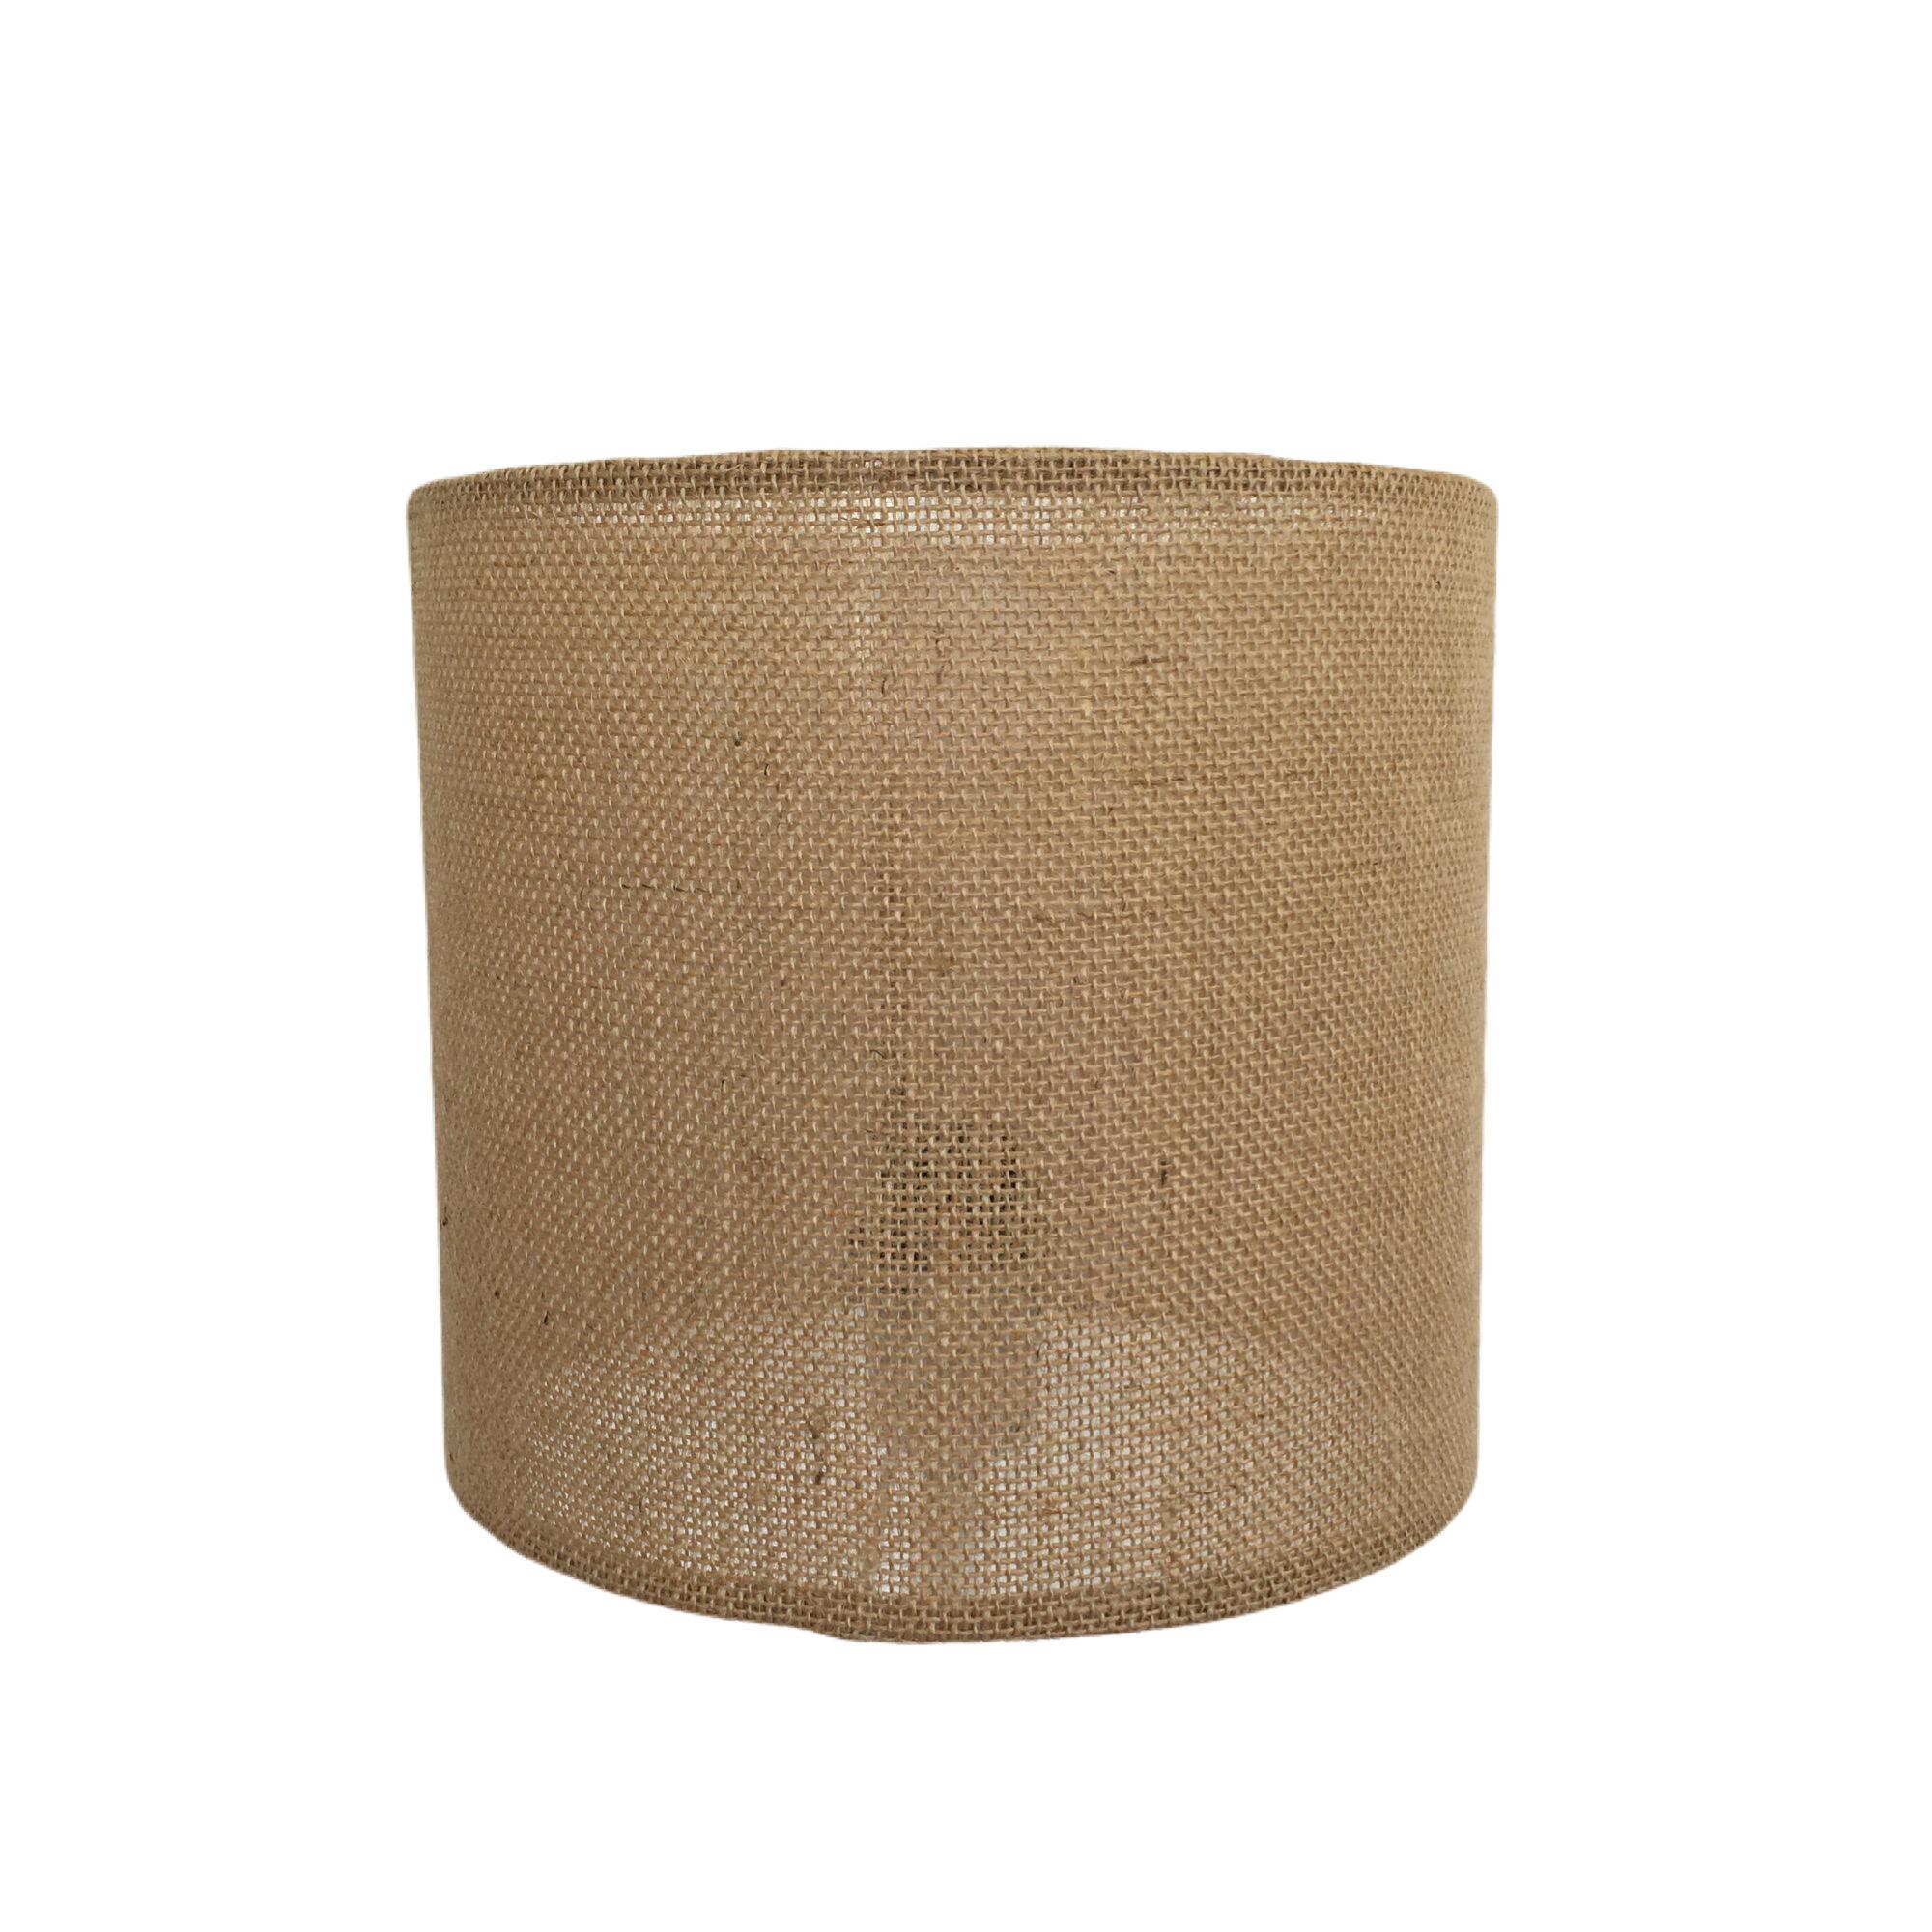 Belamp Suspension toile de jute diamètre 20 cm